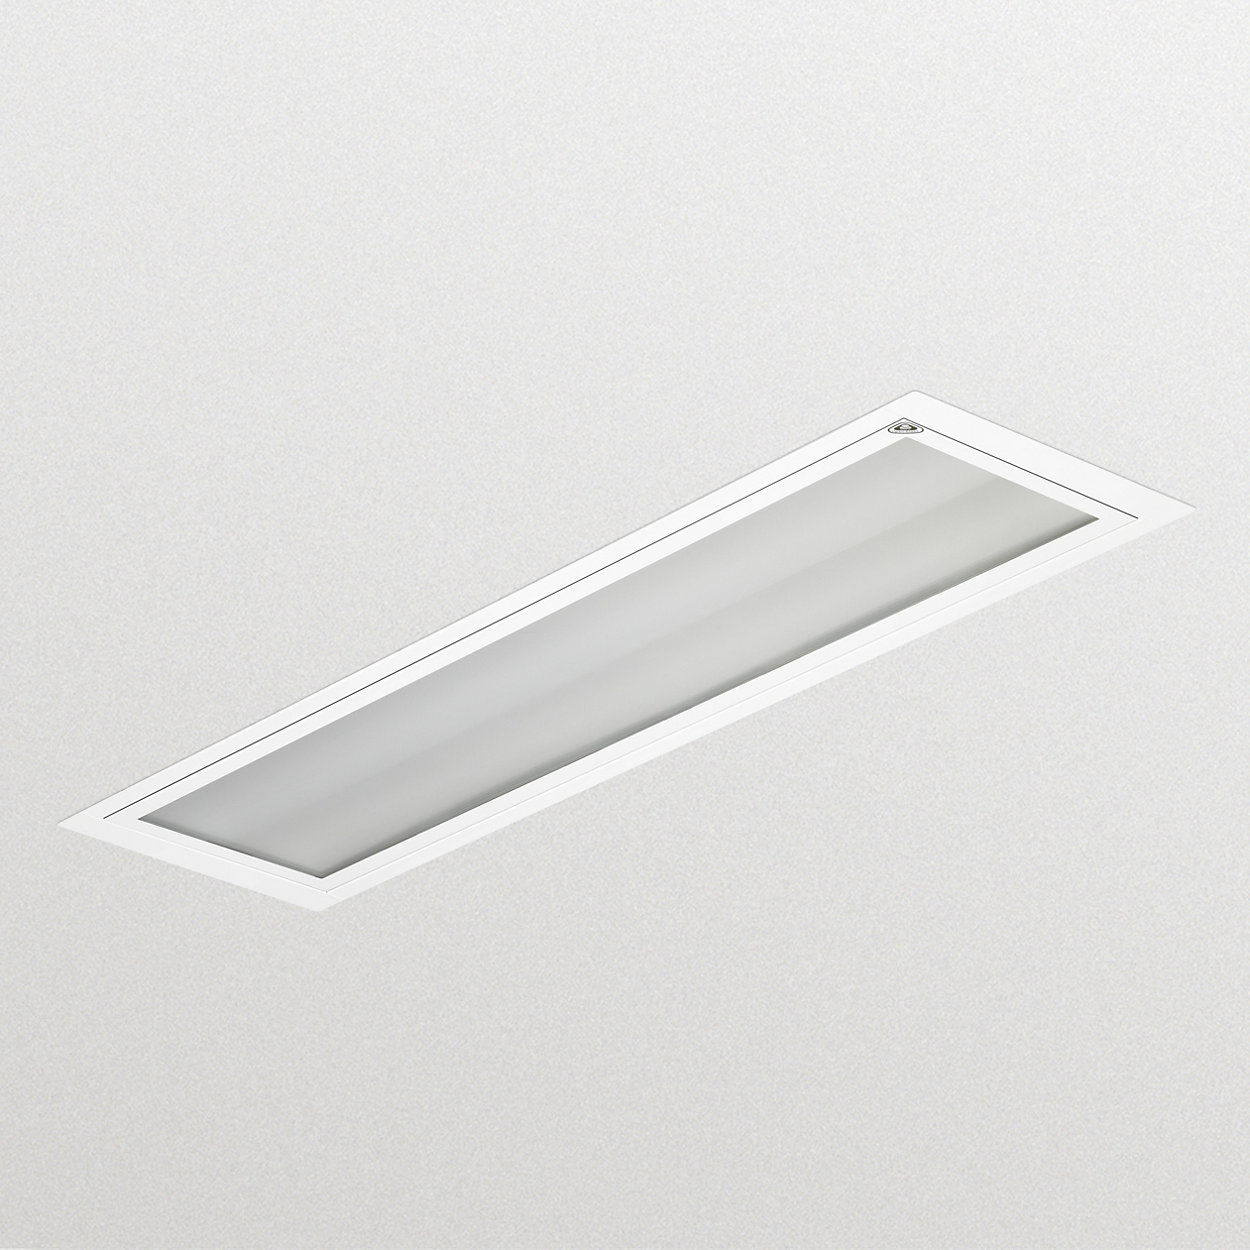 LED for renrom – hygienisk og effektivt